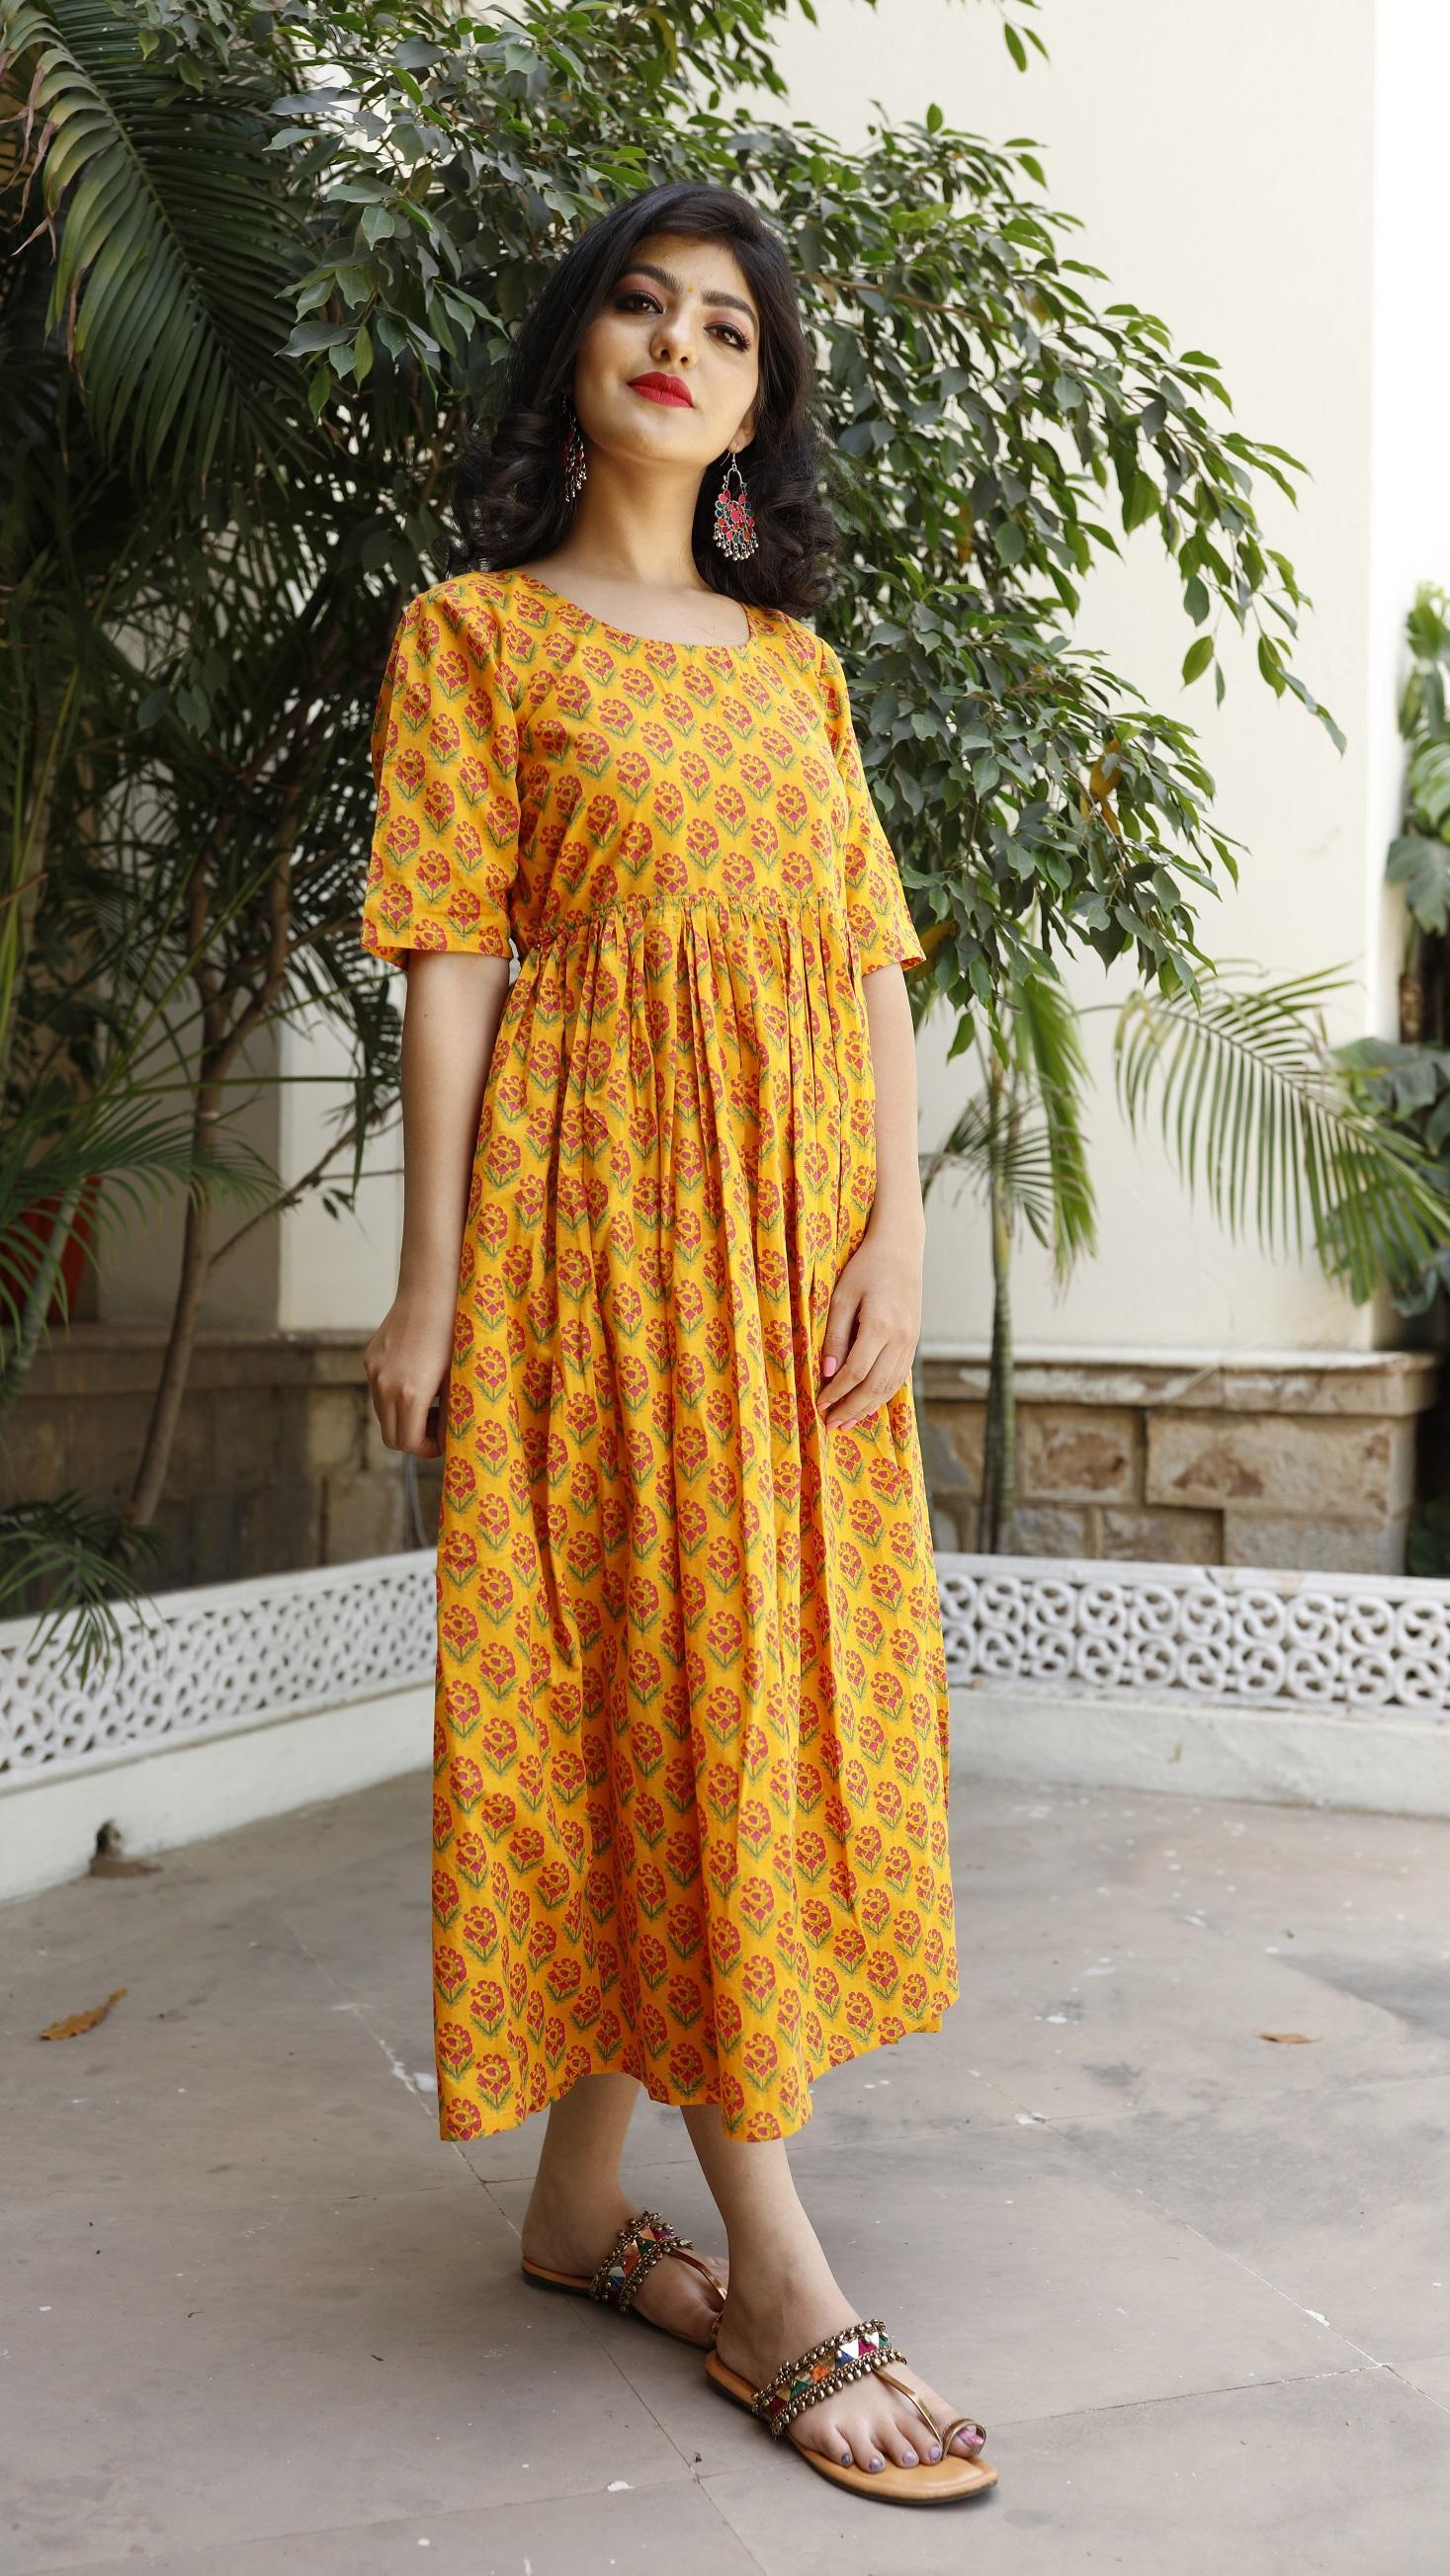 Classy Bagru Backless Maxi Dress